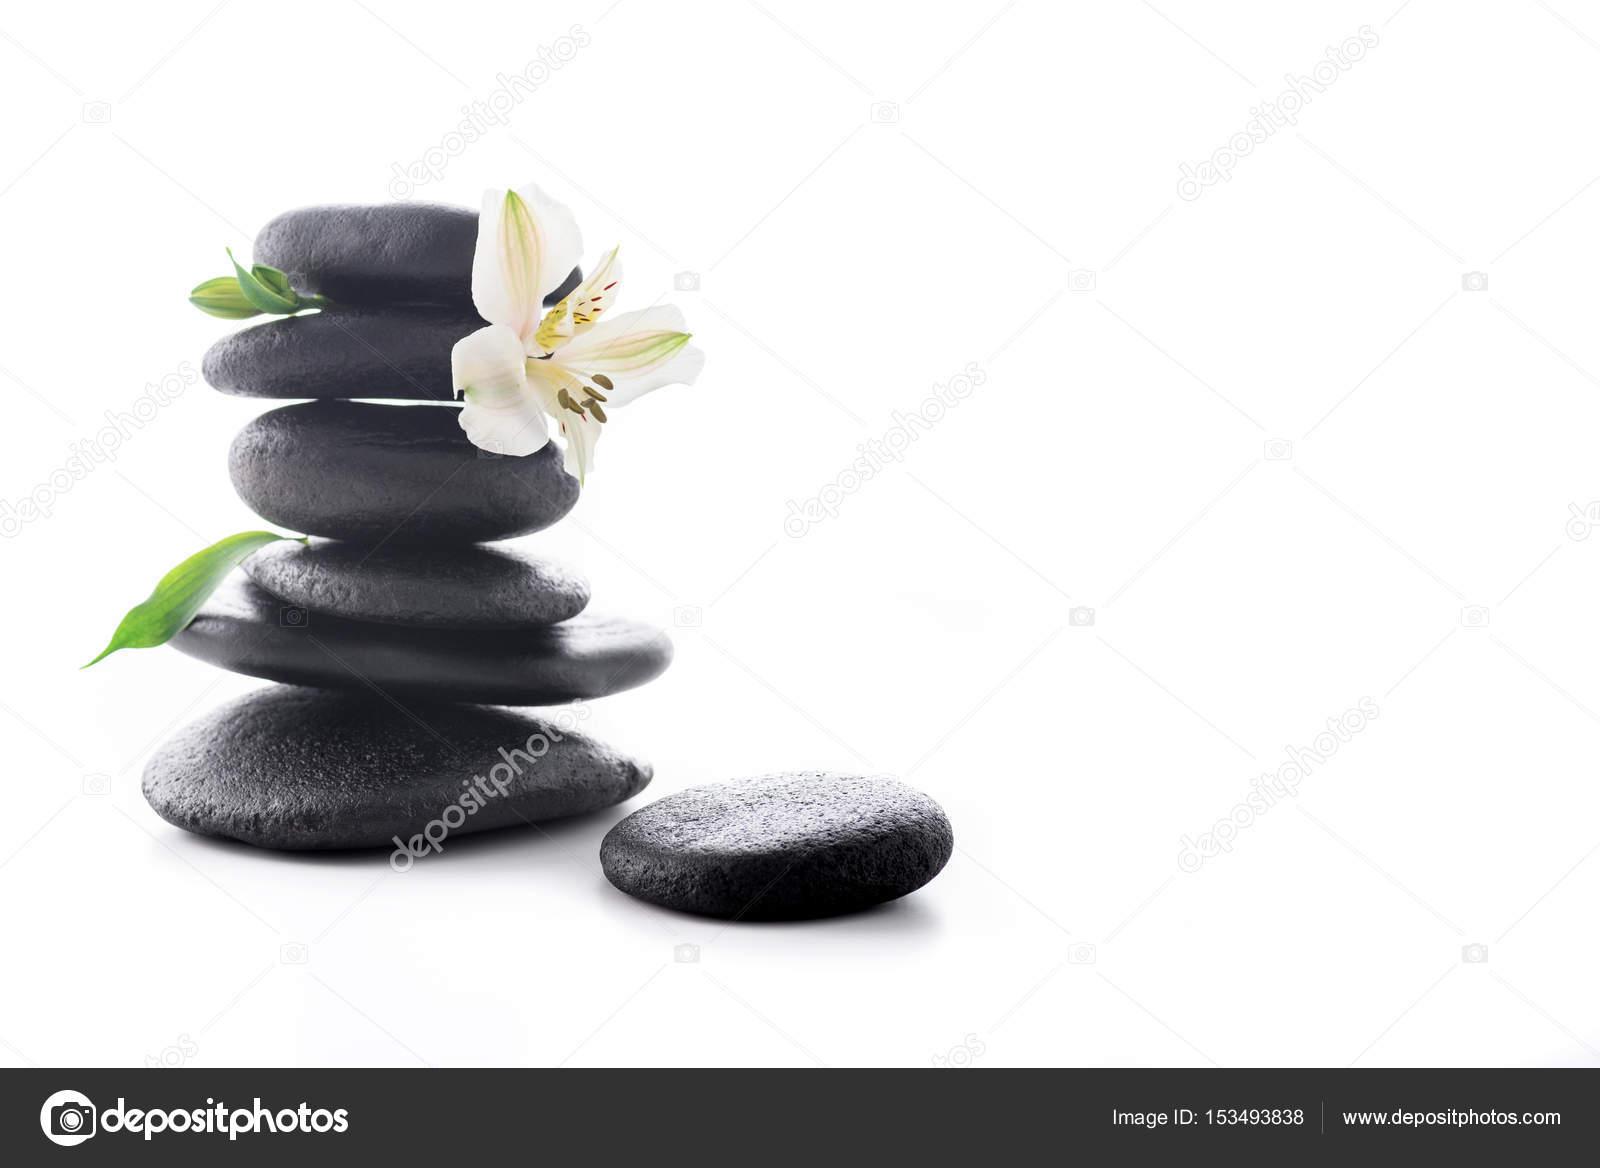 Dorable piedras zen vi eta ideas de decoraci n de for Fotos piedras zen